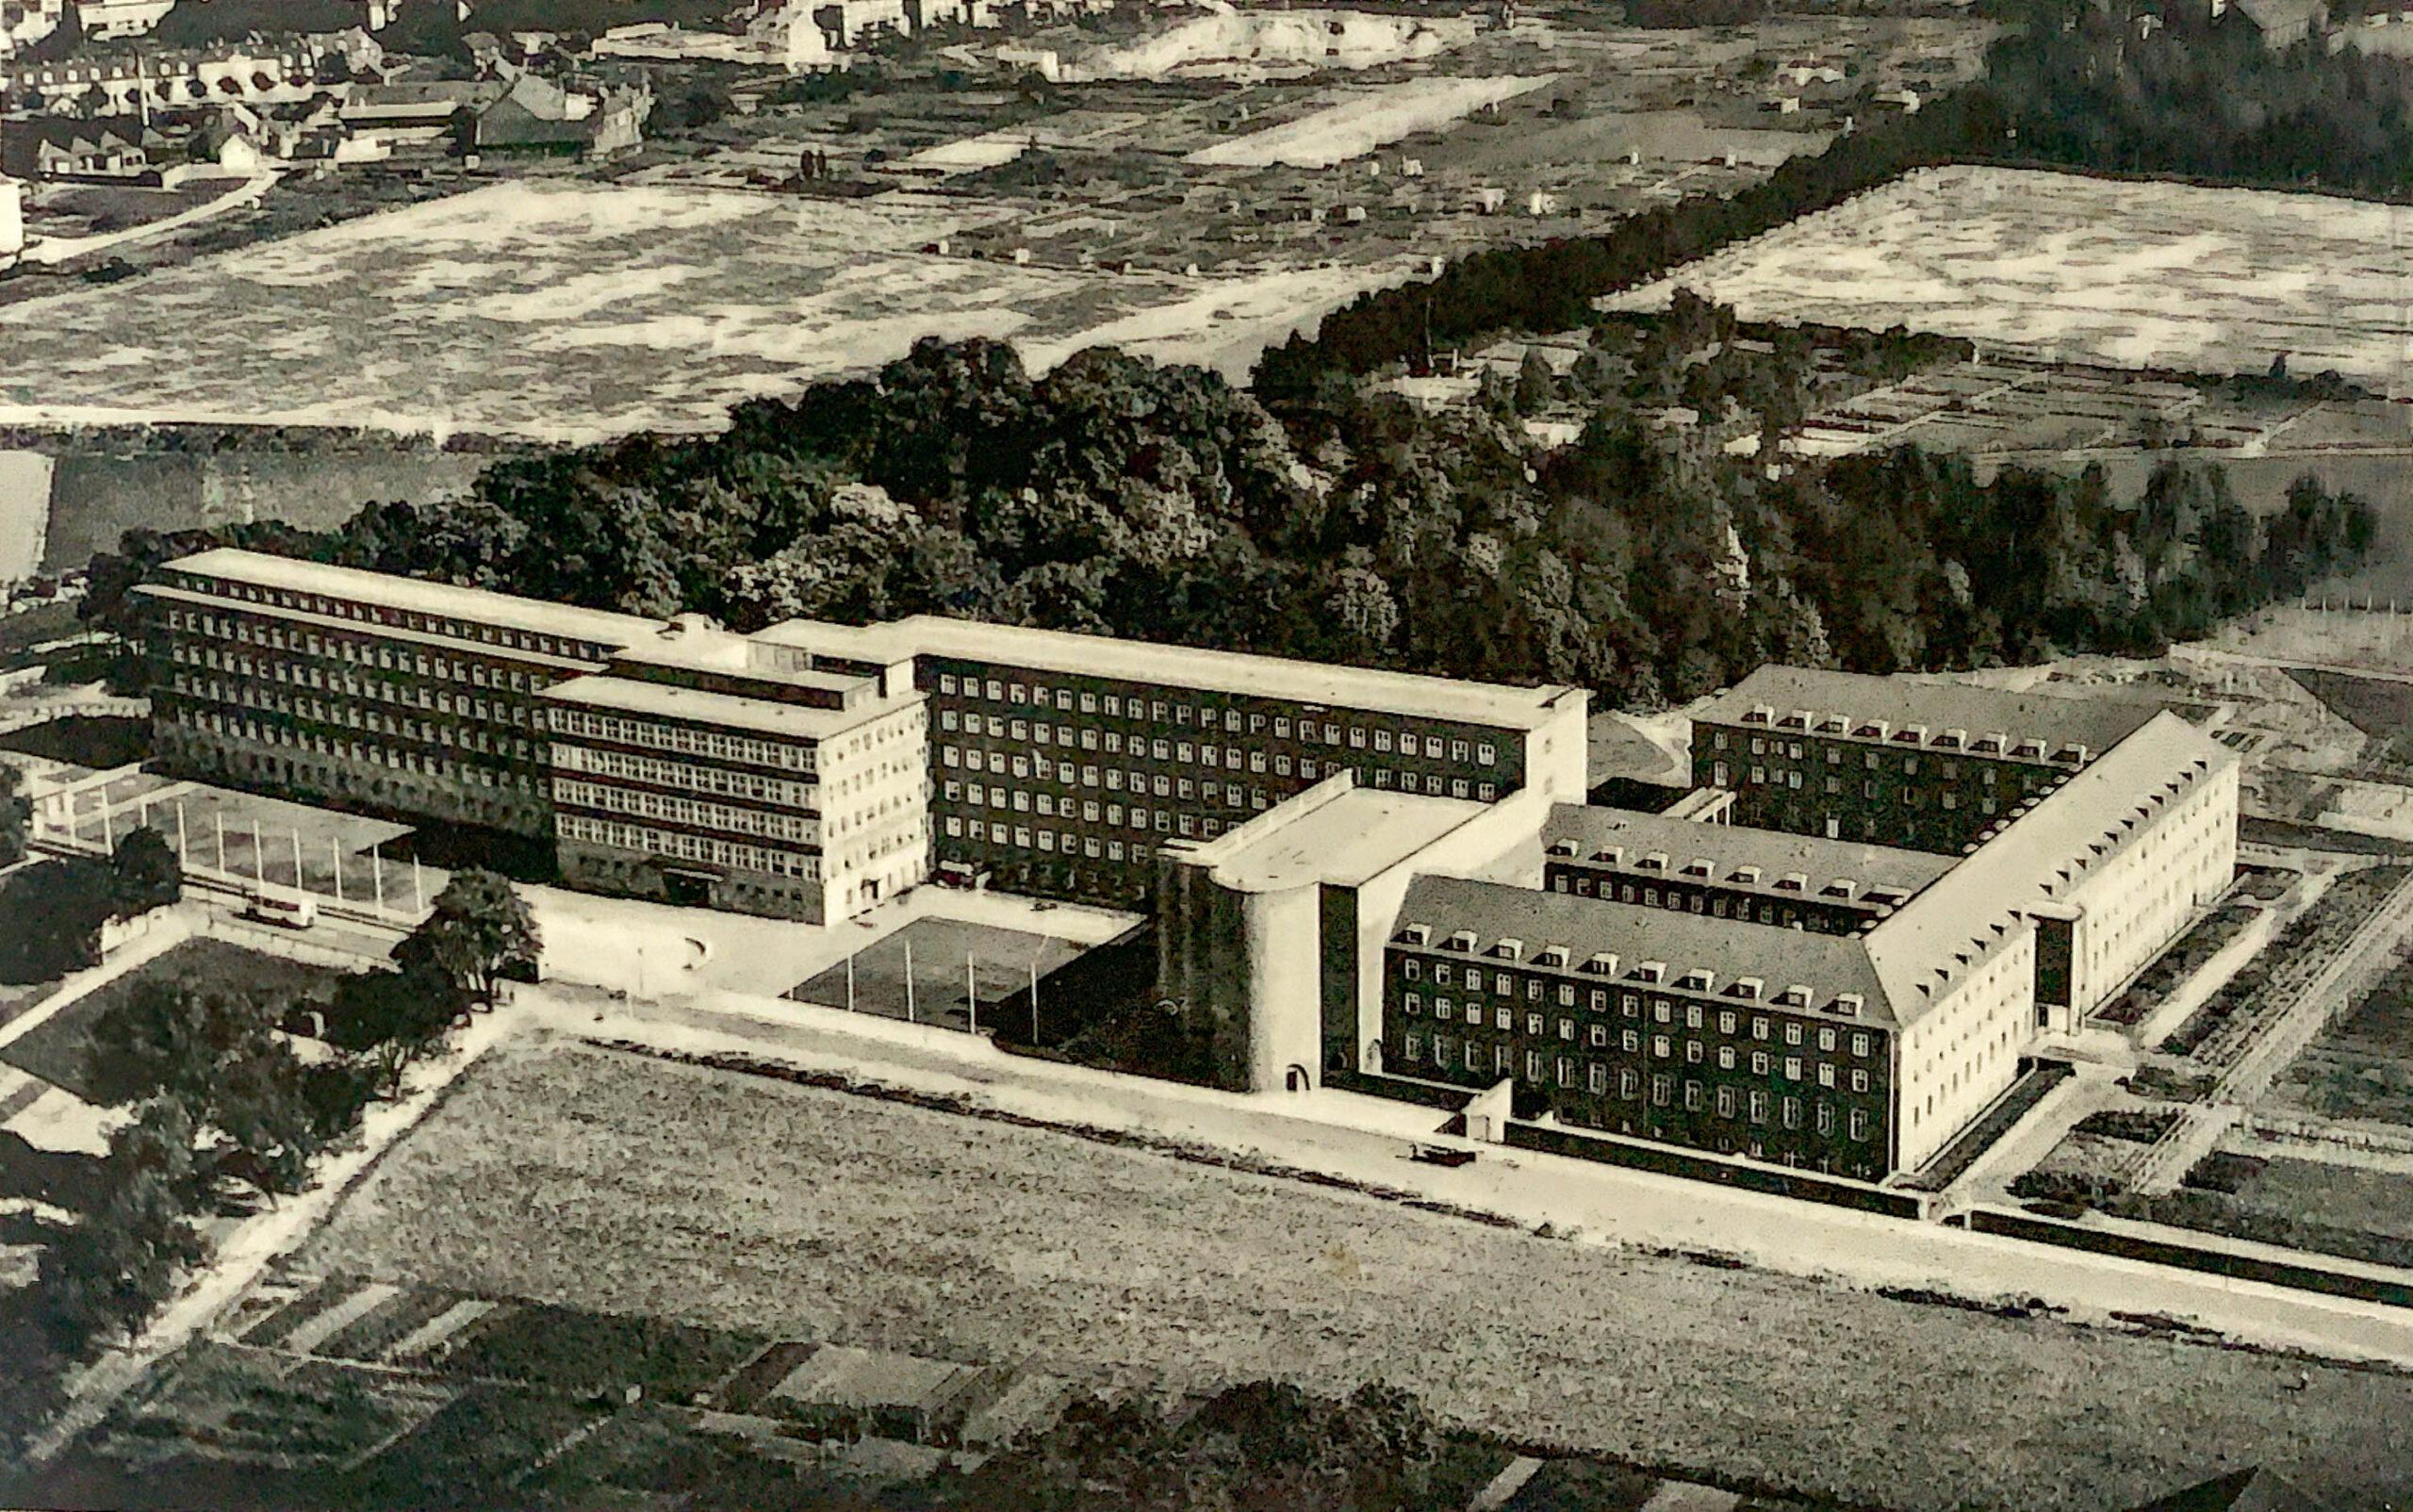 Hospital Sankt Elisabeth, Cologne-Hohenlind. Architects: Hans Tietmann, Karl Haake